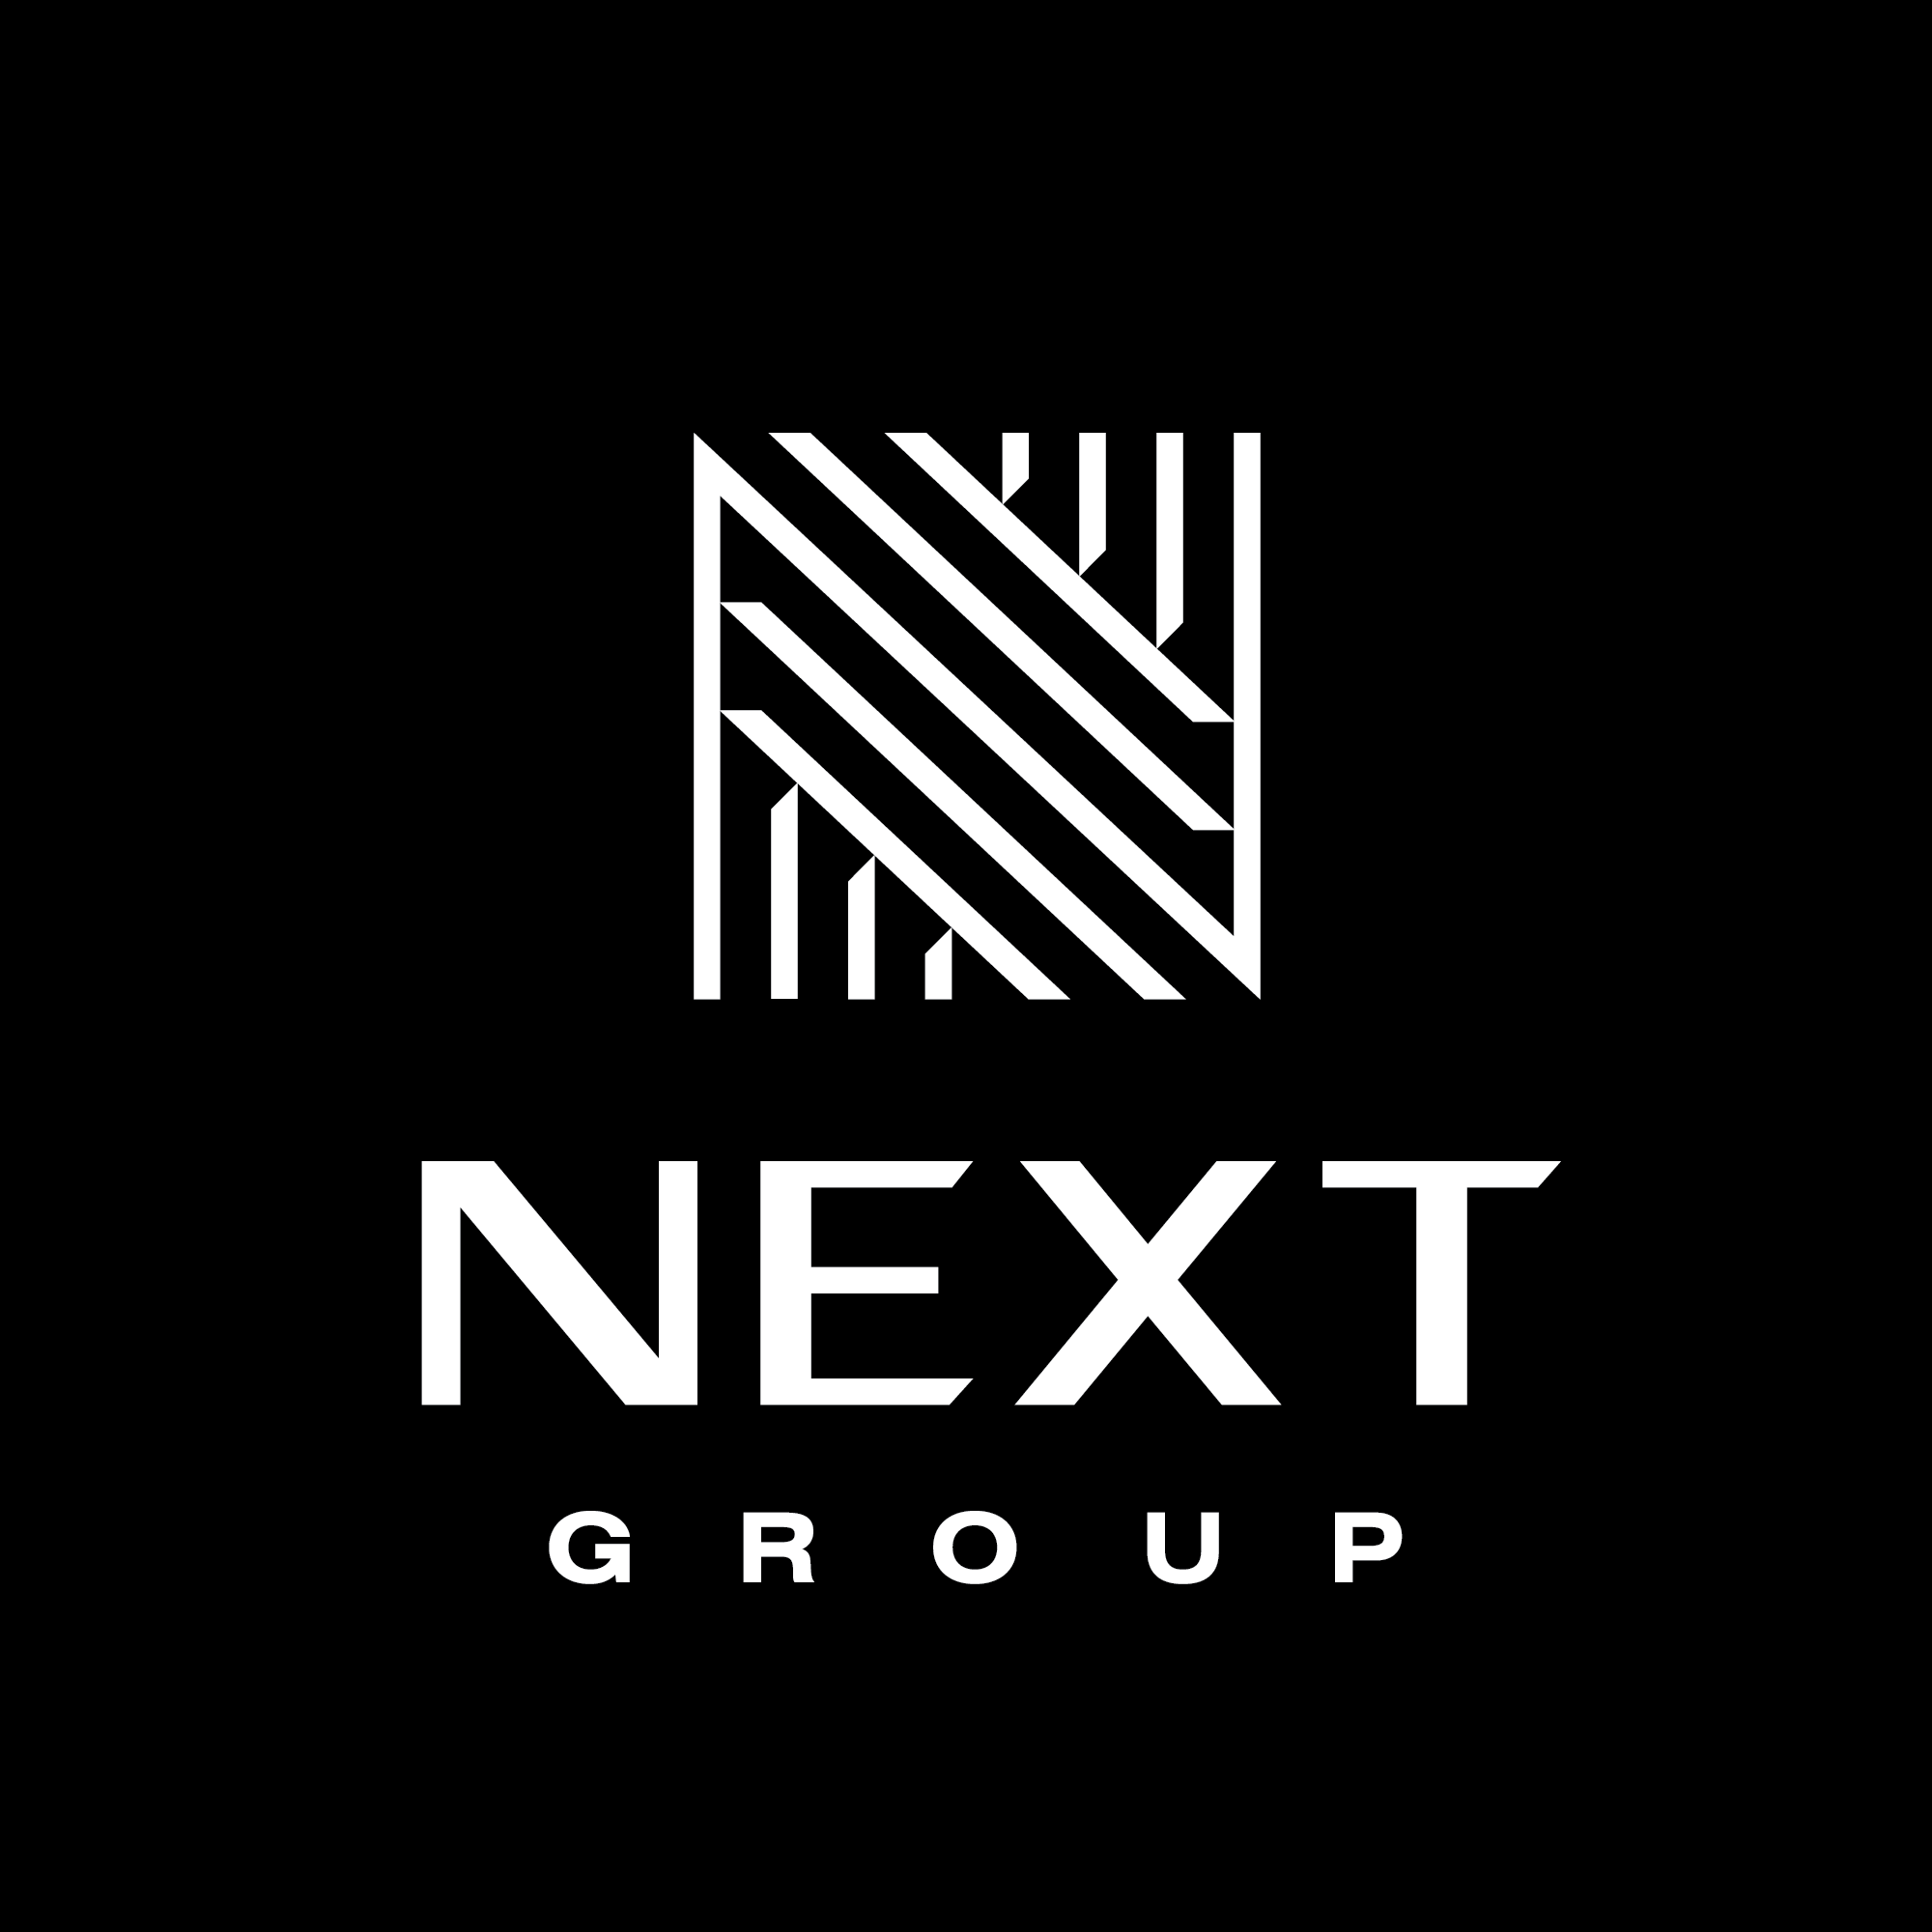 Next Group